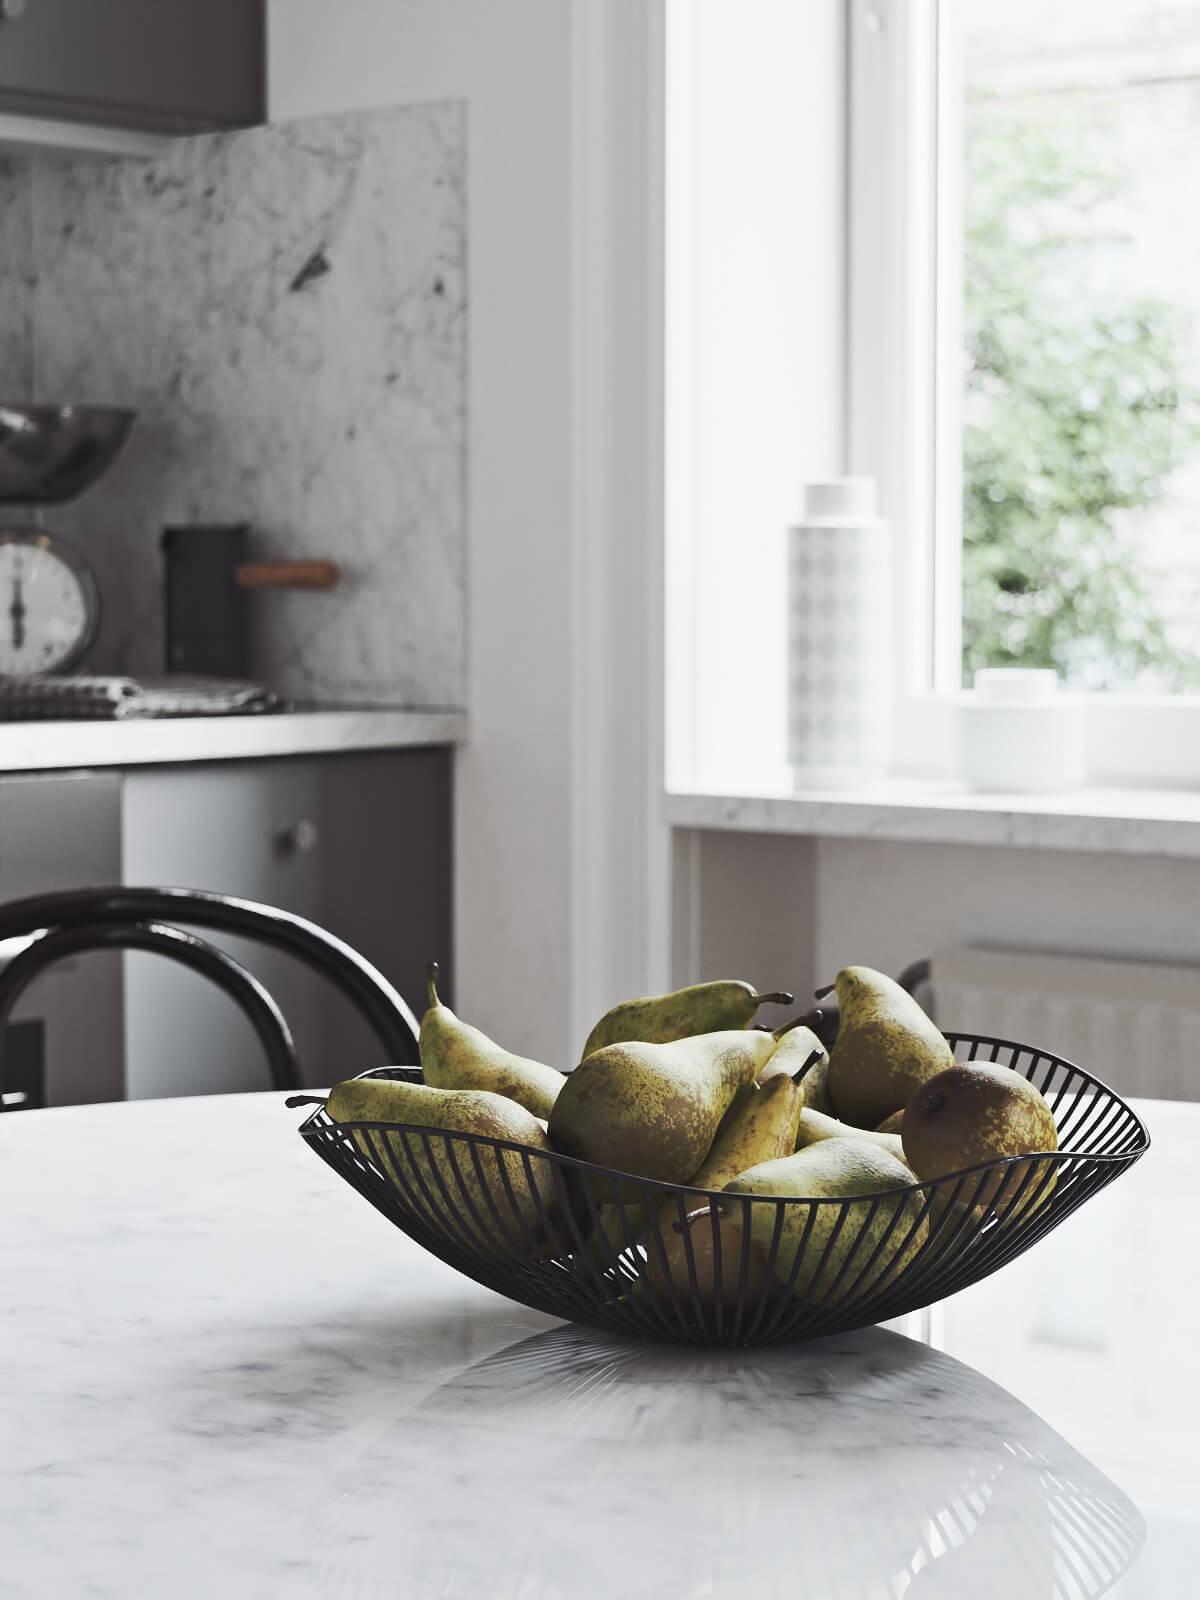 Scandinavian flat kitchen dining table fruits - cgi visualization